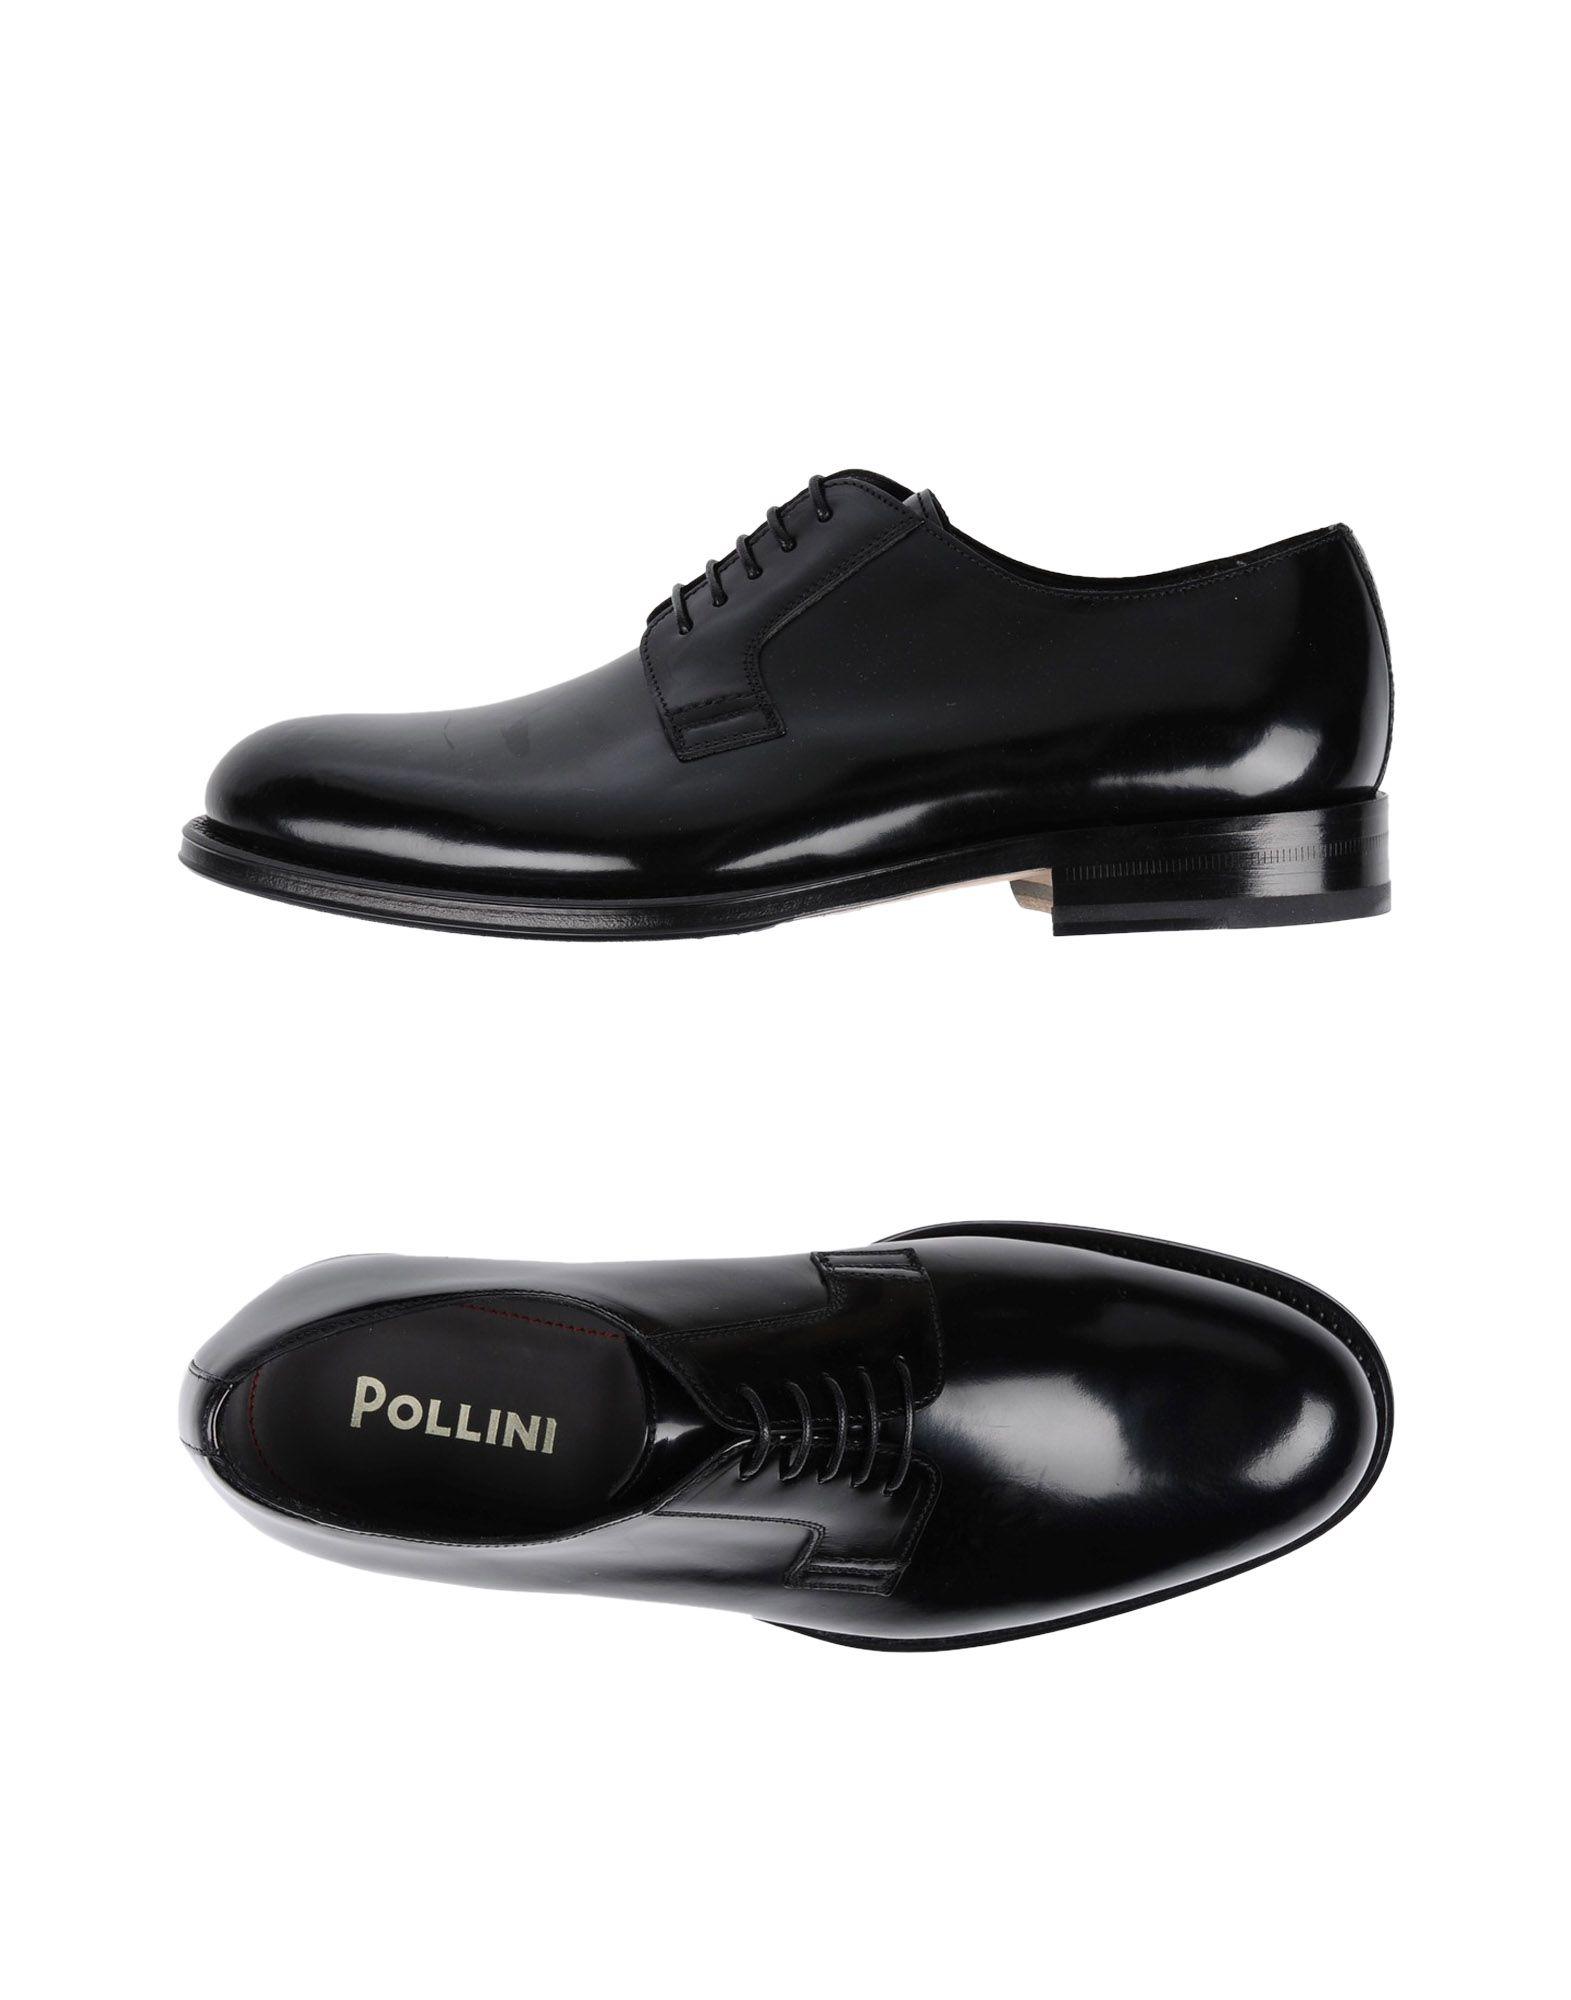 Moda Stringate Pollini Uomo - 11447423GD